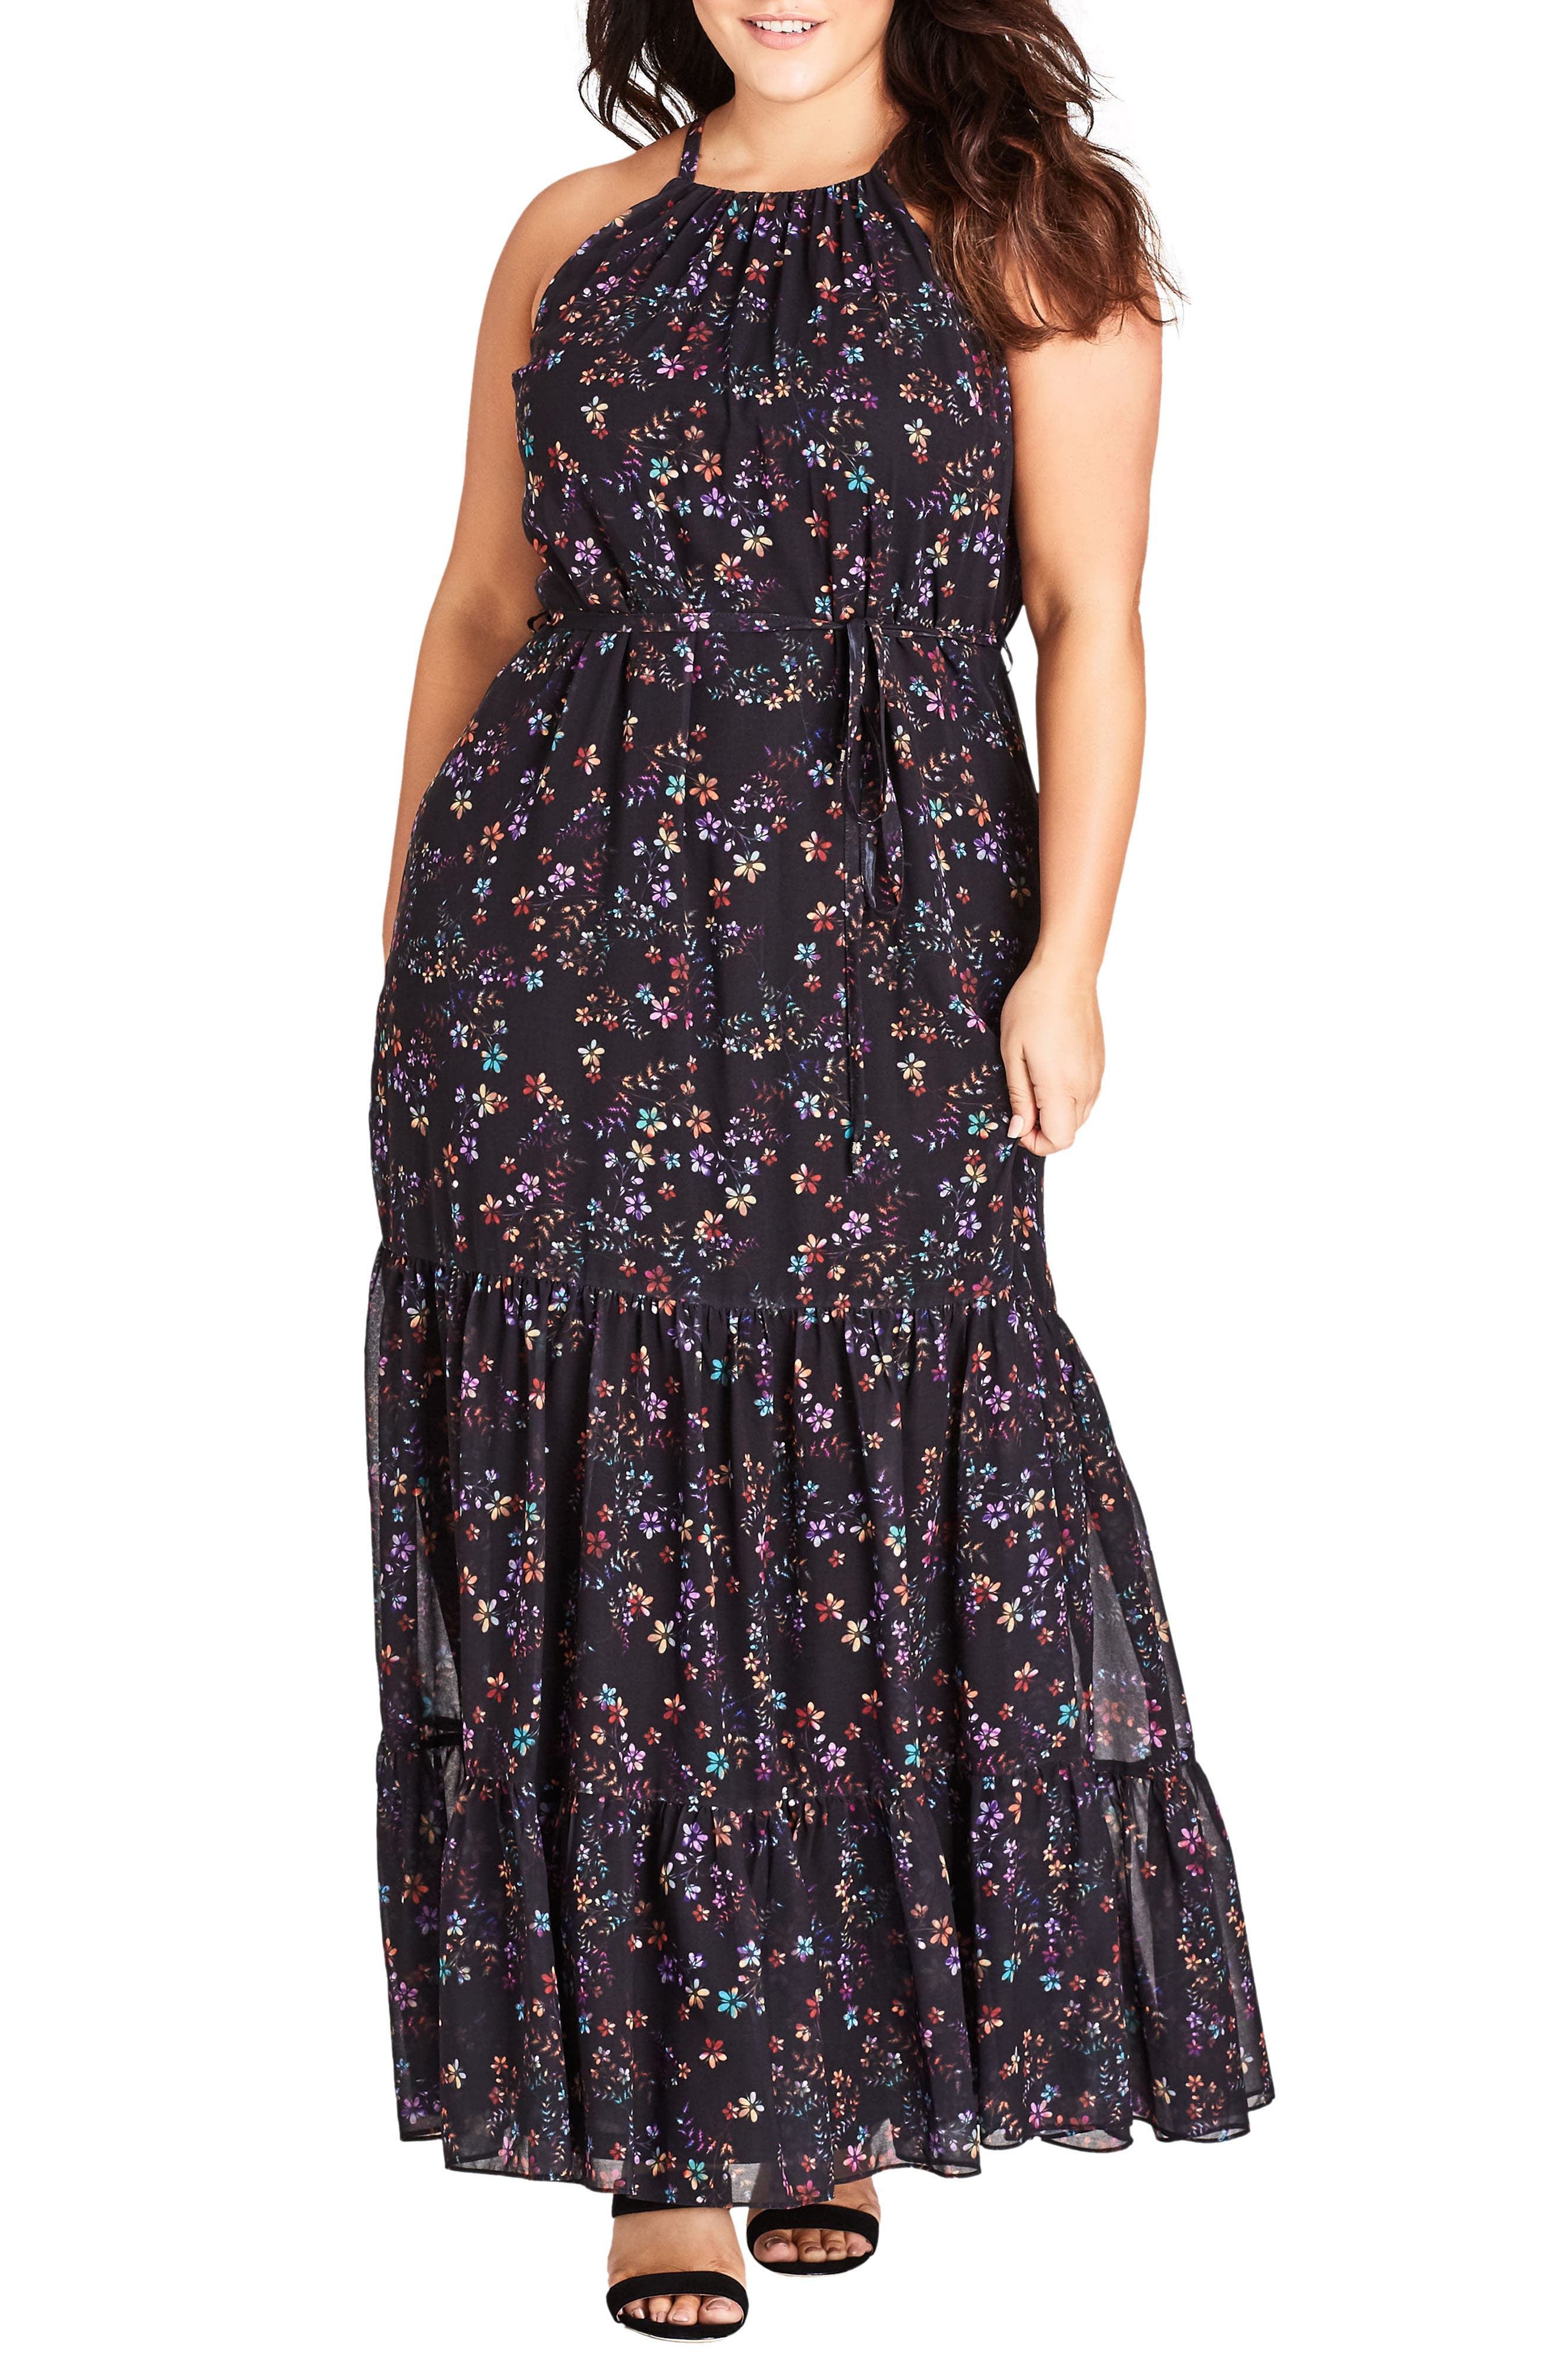 Sweet Dreams Maxi Dress,                         Main,                         color, DREAMY FLORAL